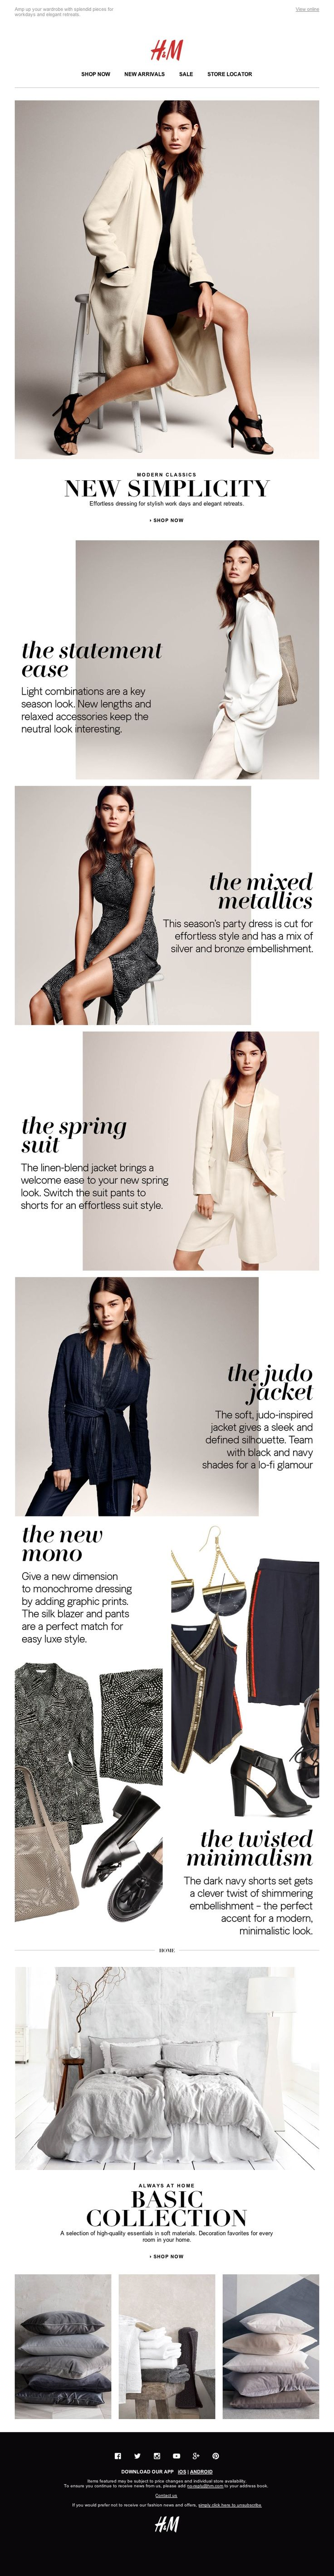 H&M - An elegant hint of spring